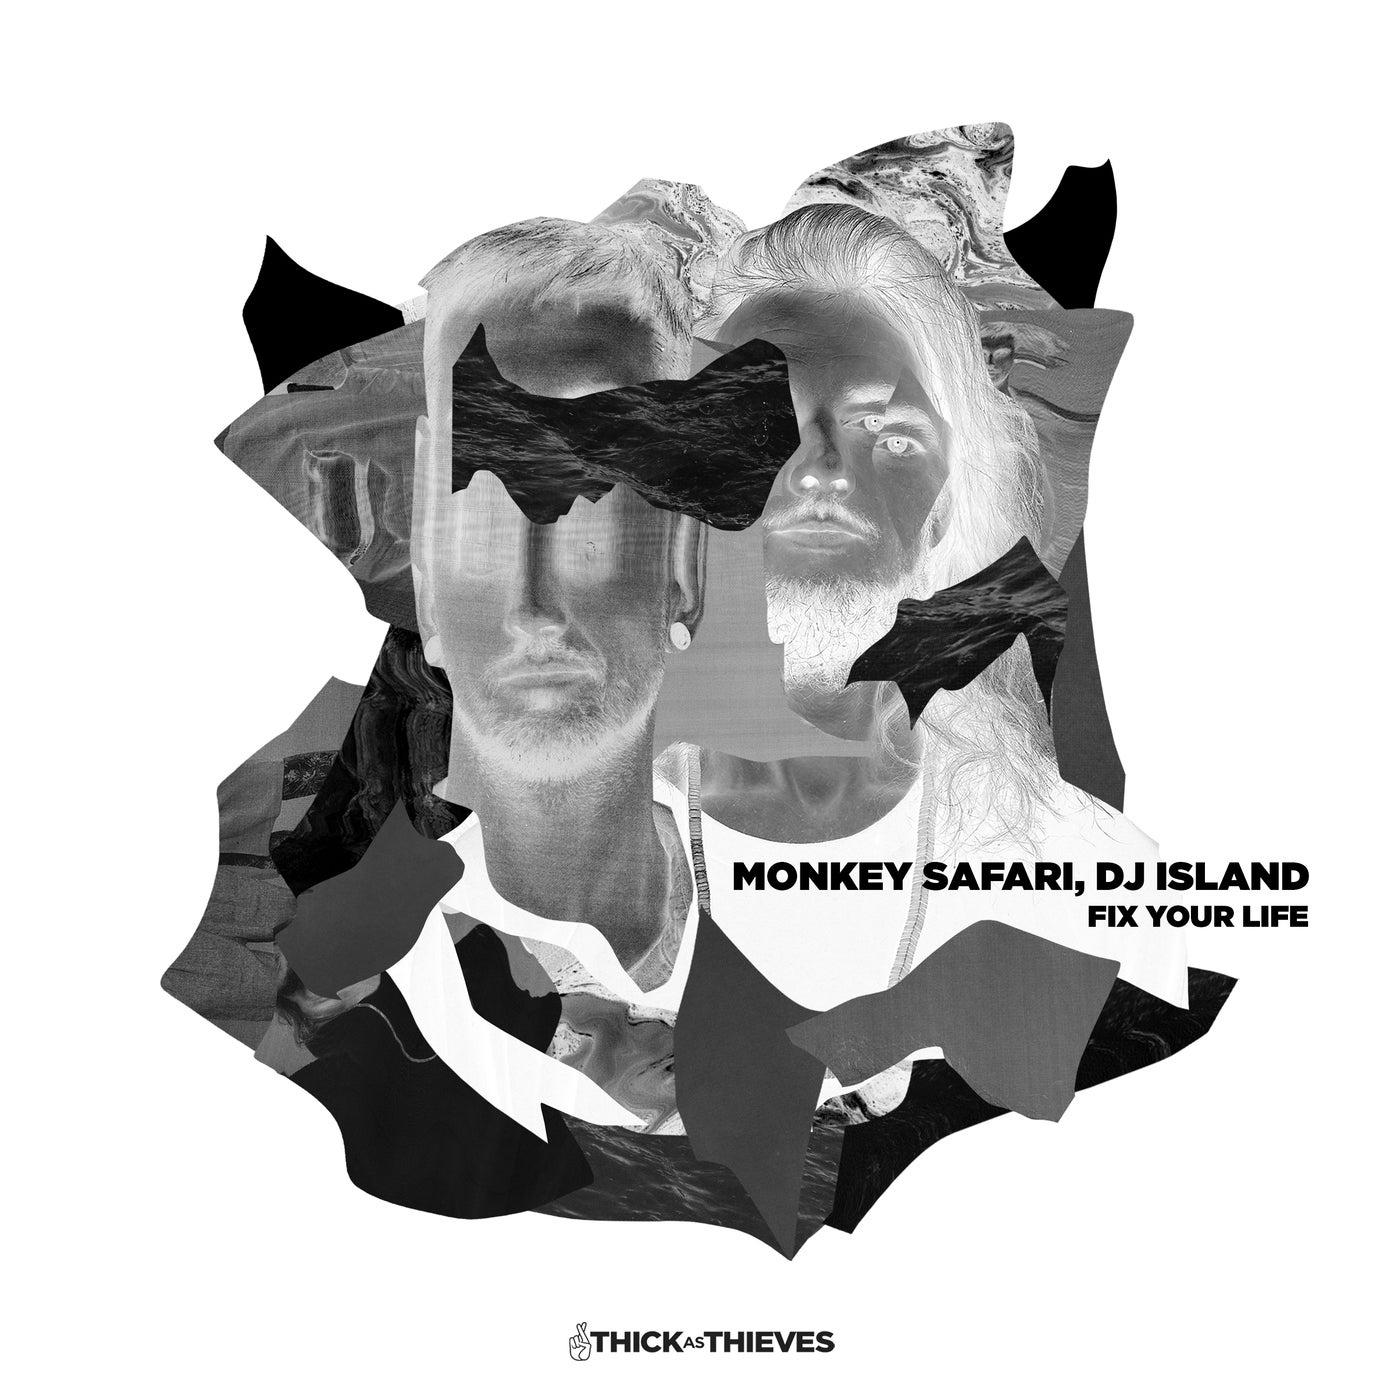 Monkey Safari, DJ Island – Fix Your Life